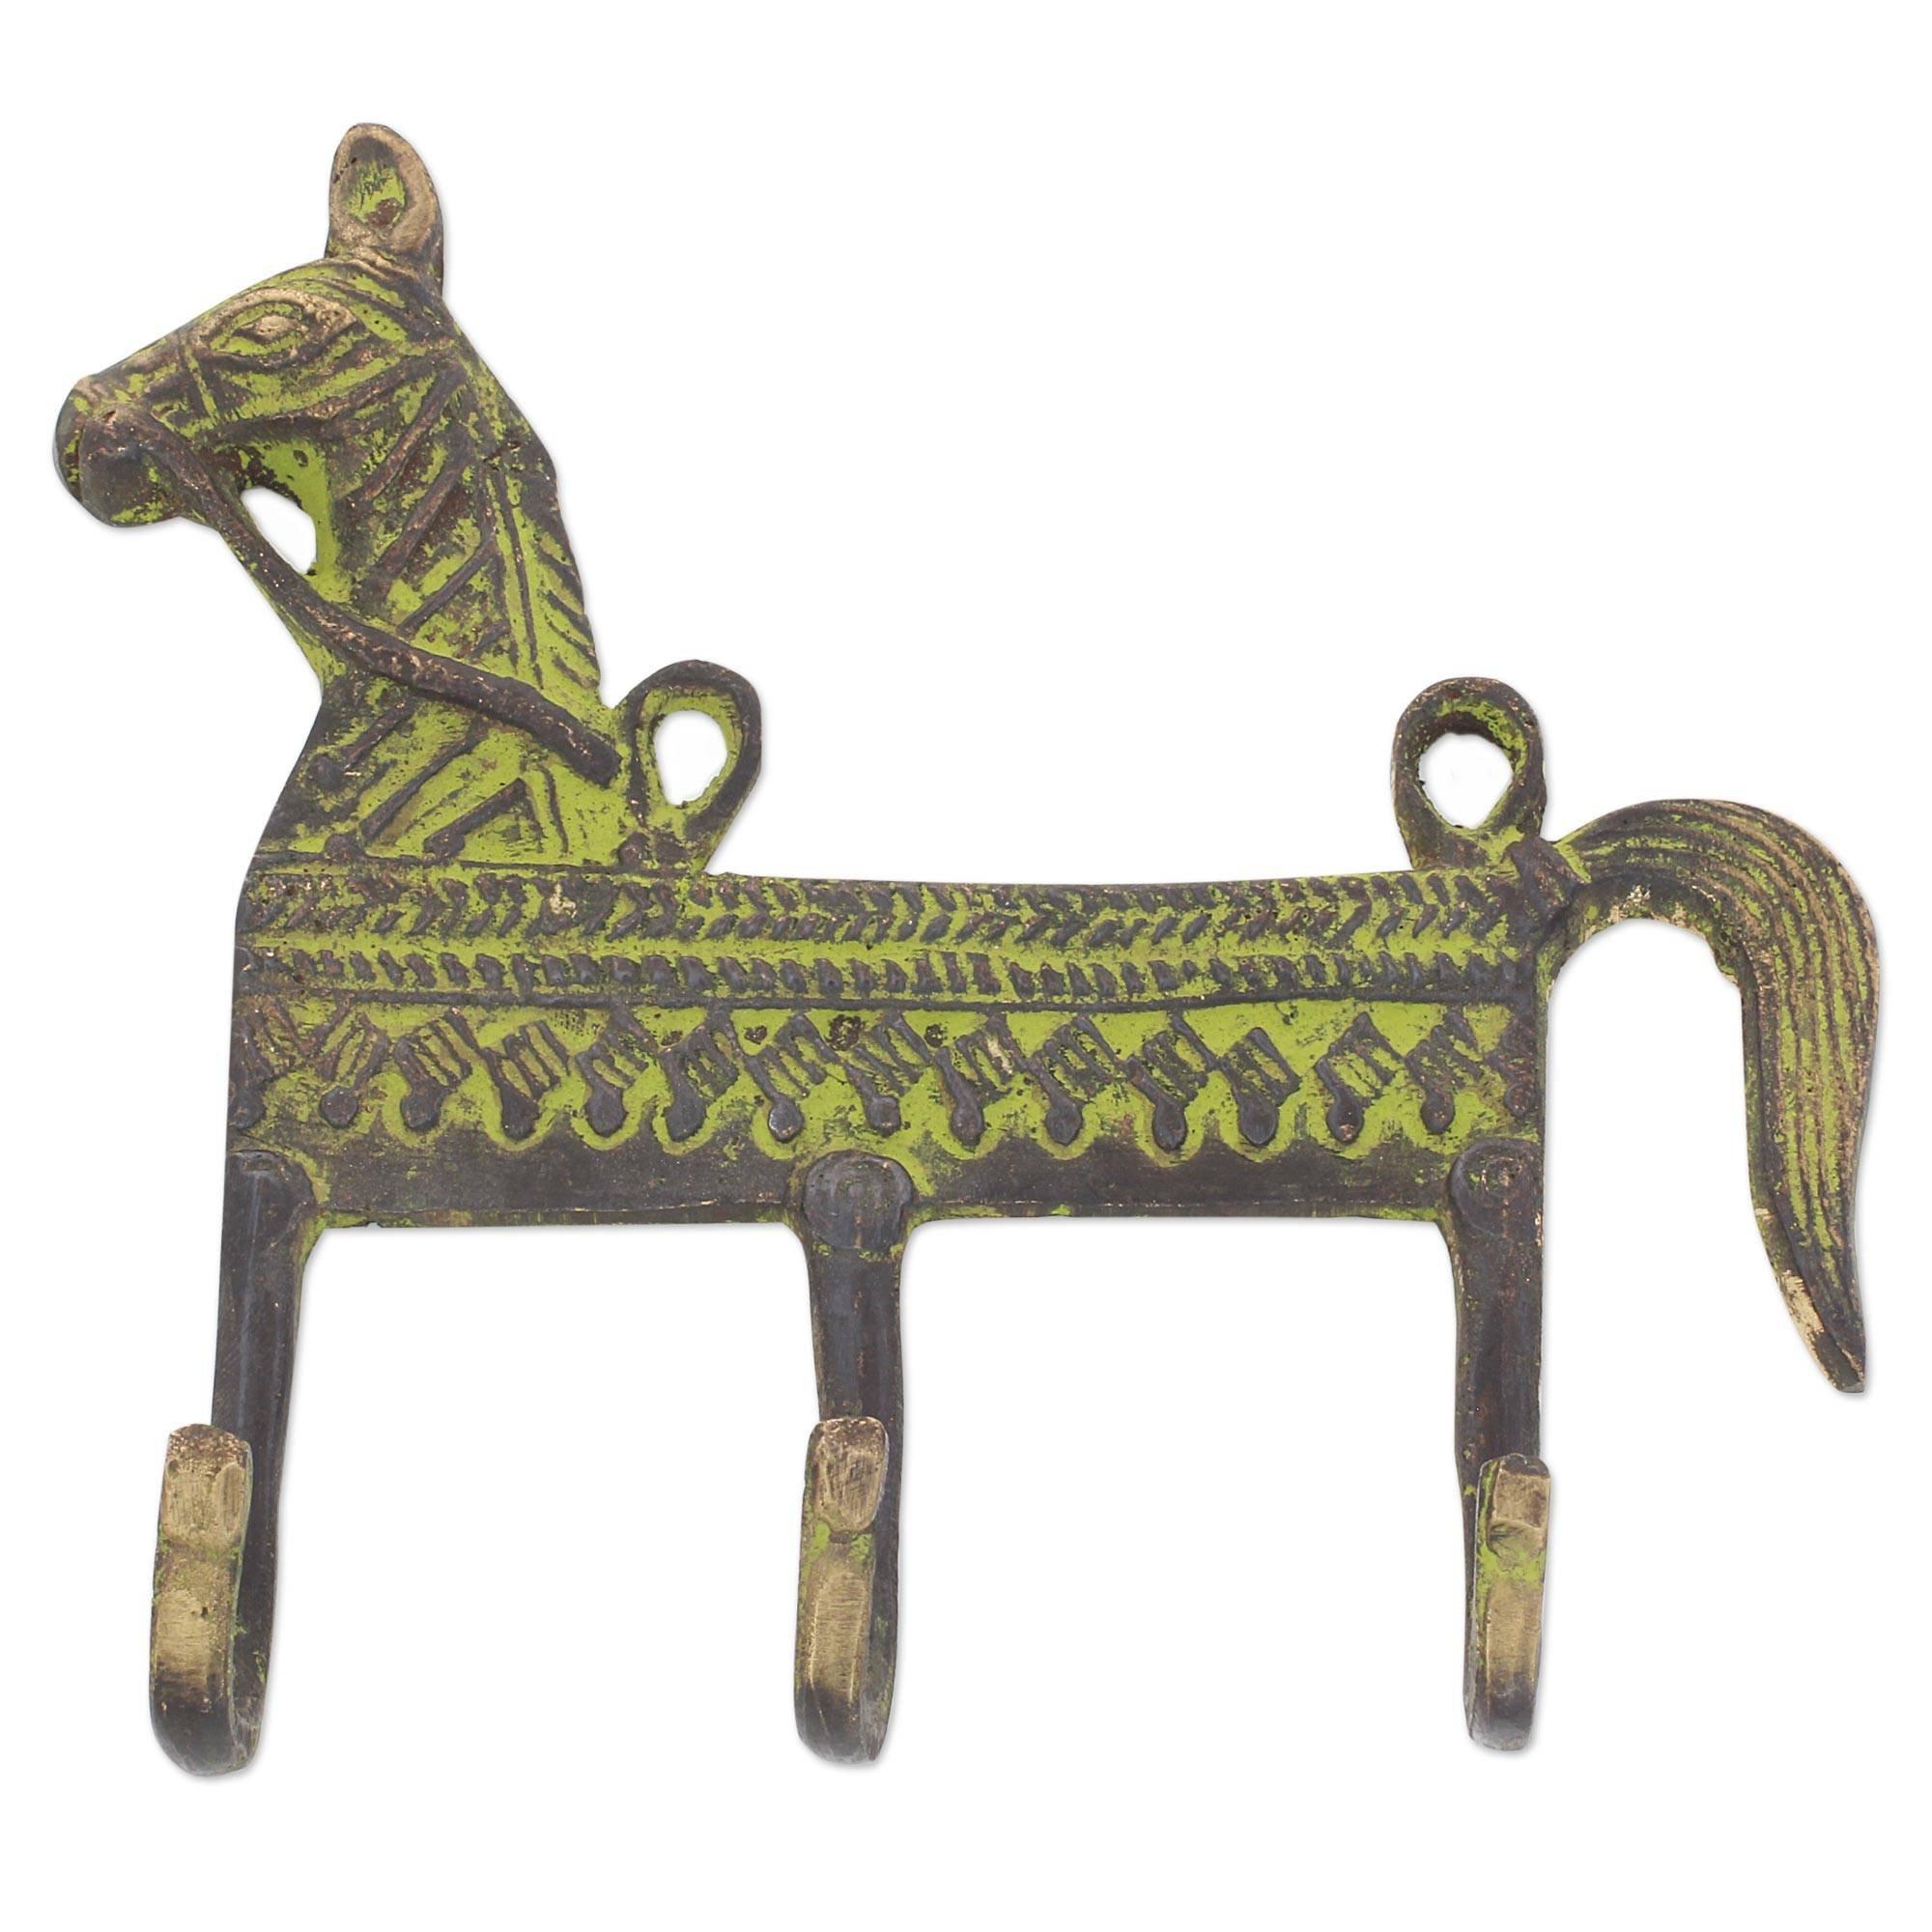 NOVICA Animal Themed Metallic Brass Wall Mounted Coat Hanger, Green, Helpful Horse' by NOVICA